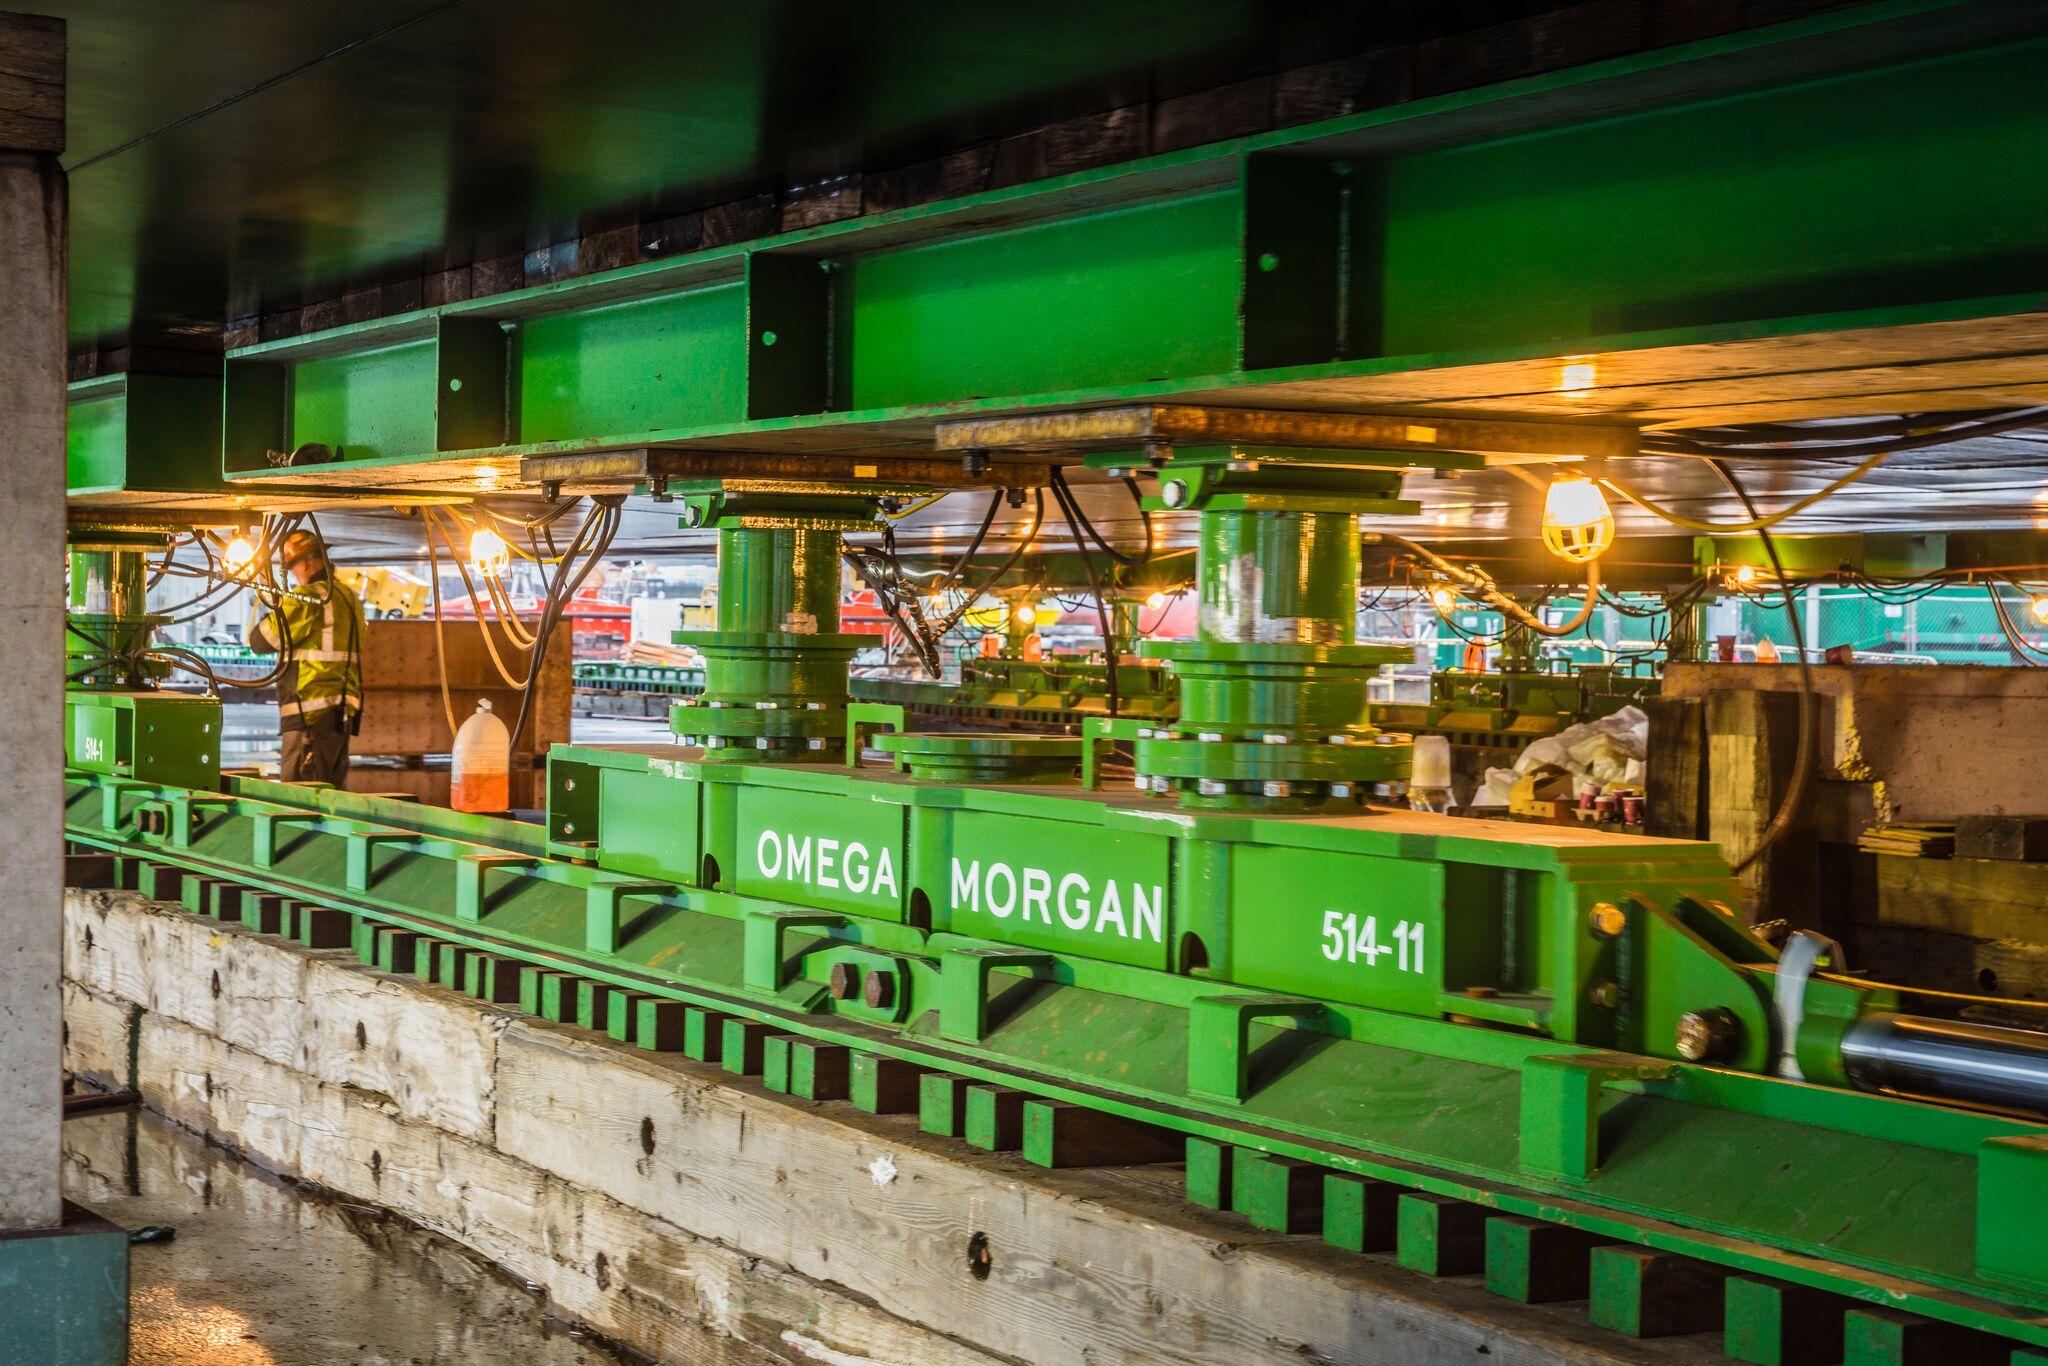 underneath the Omega Morgan heavy slide system under barge